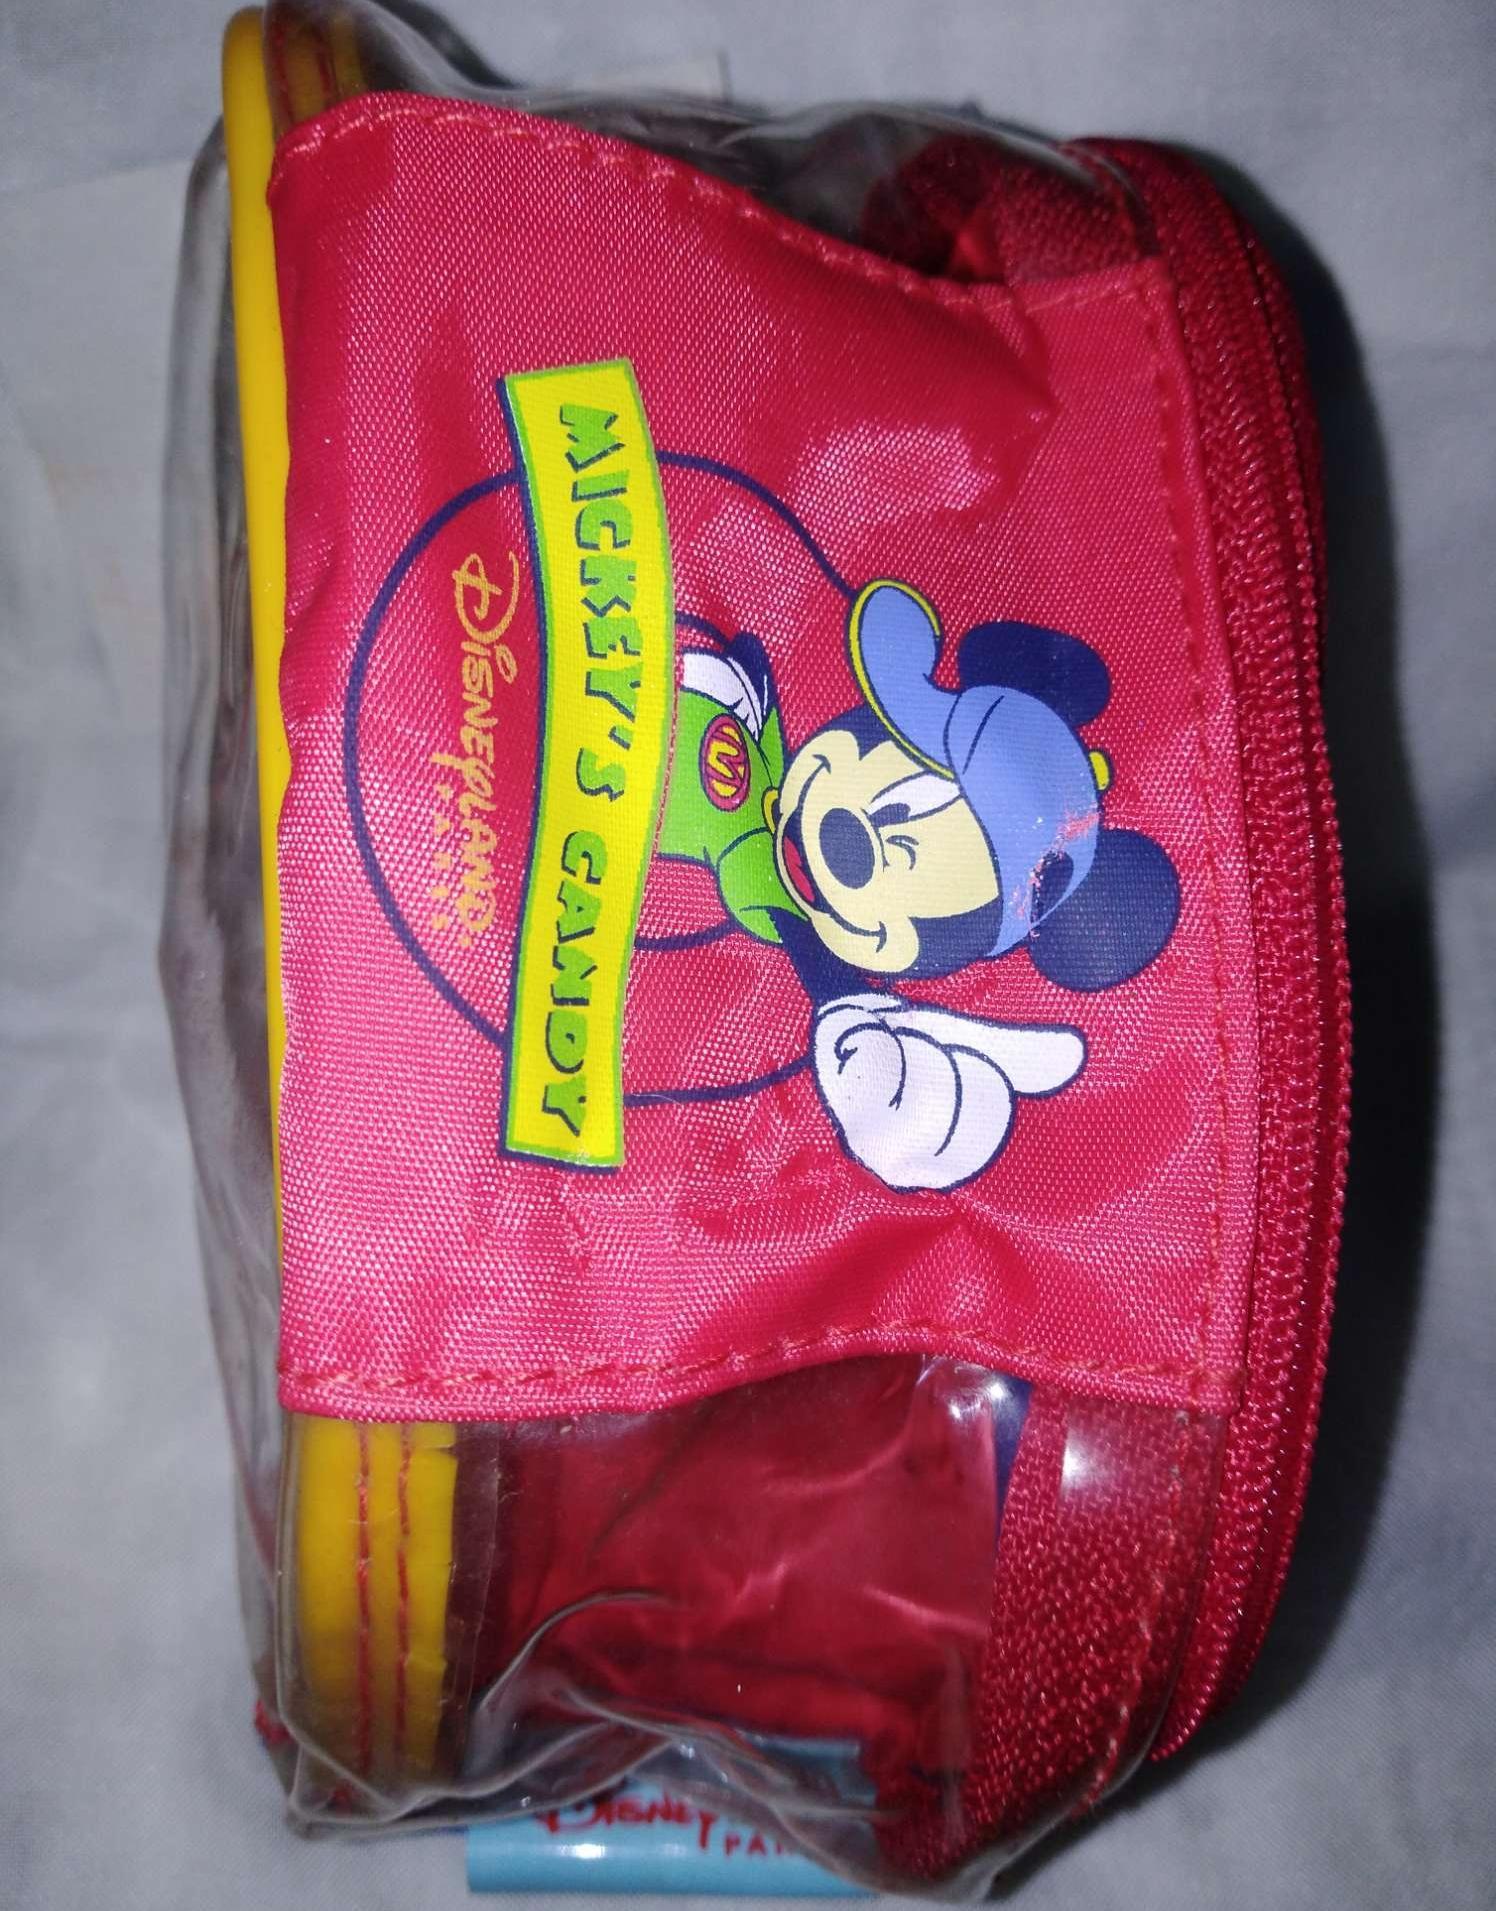 Mickey Kids Belt Bag By Cj7 Shop.